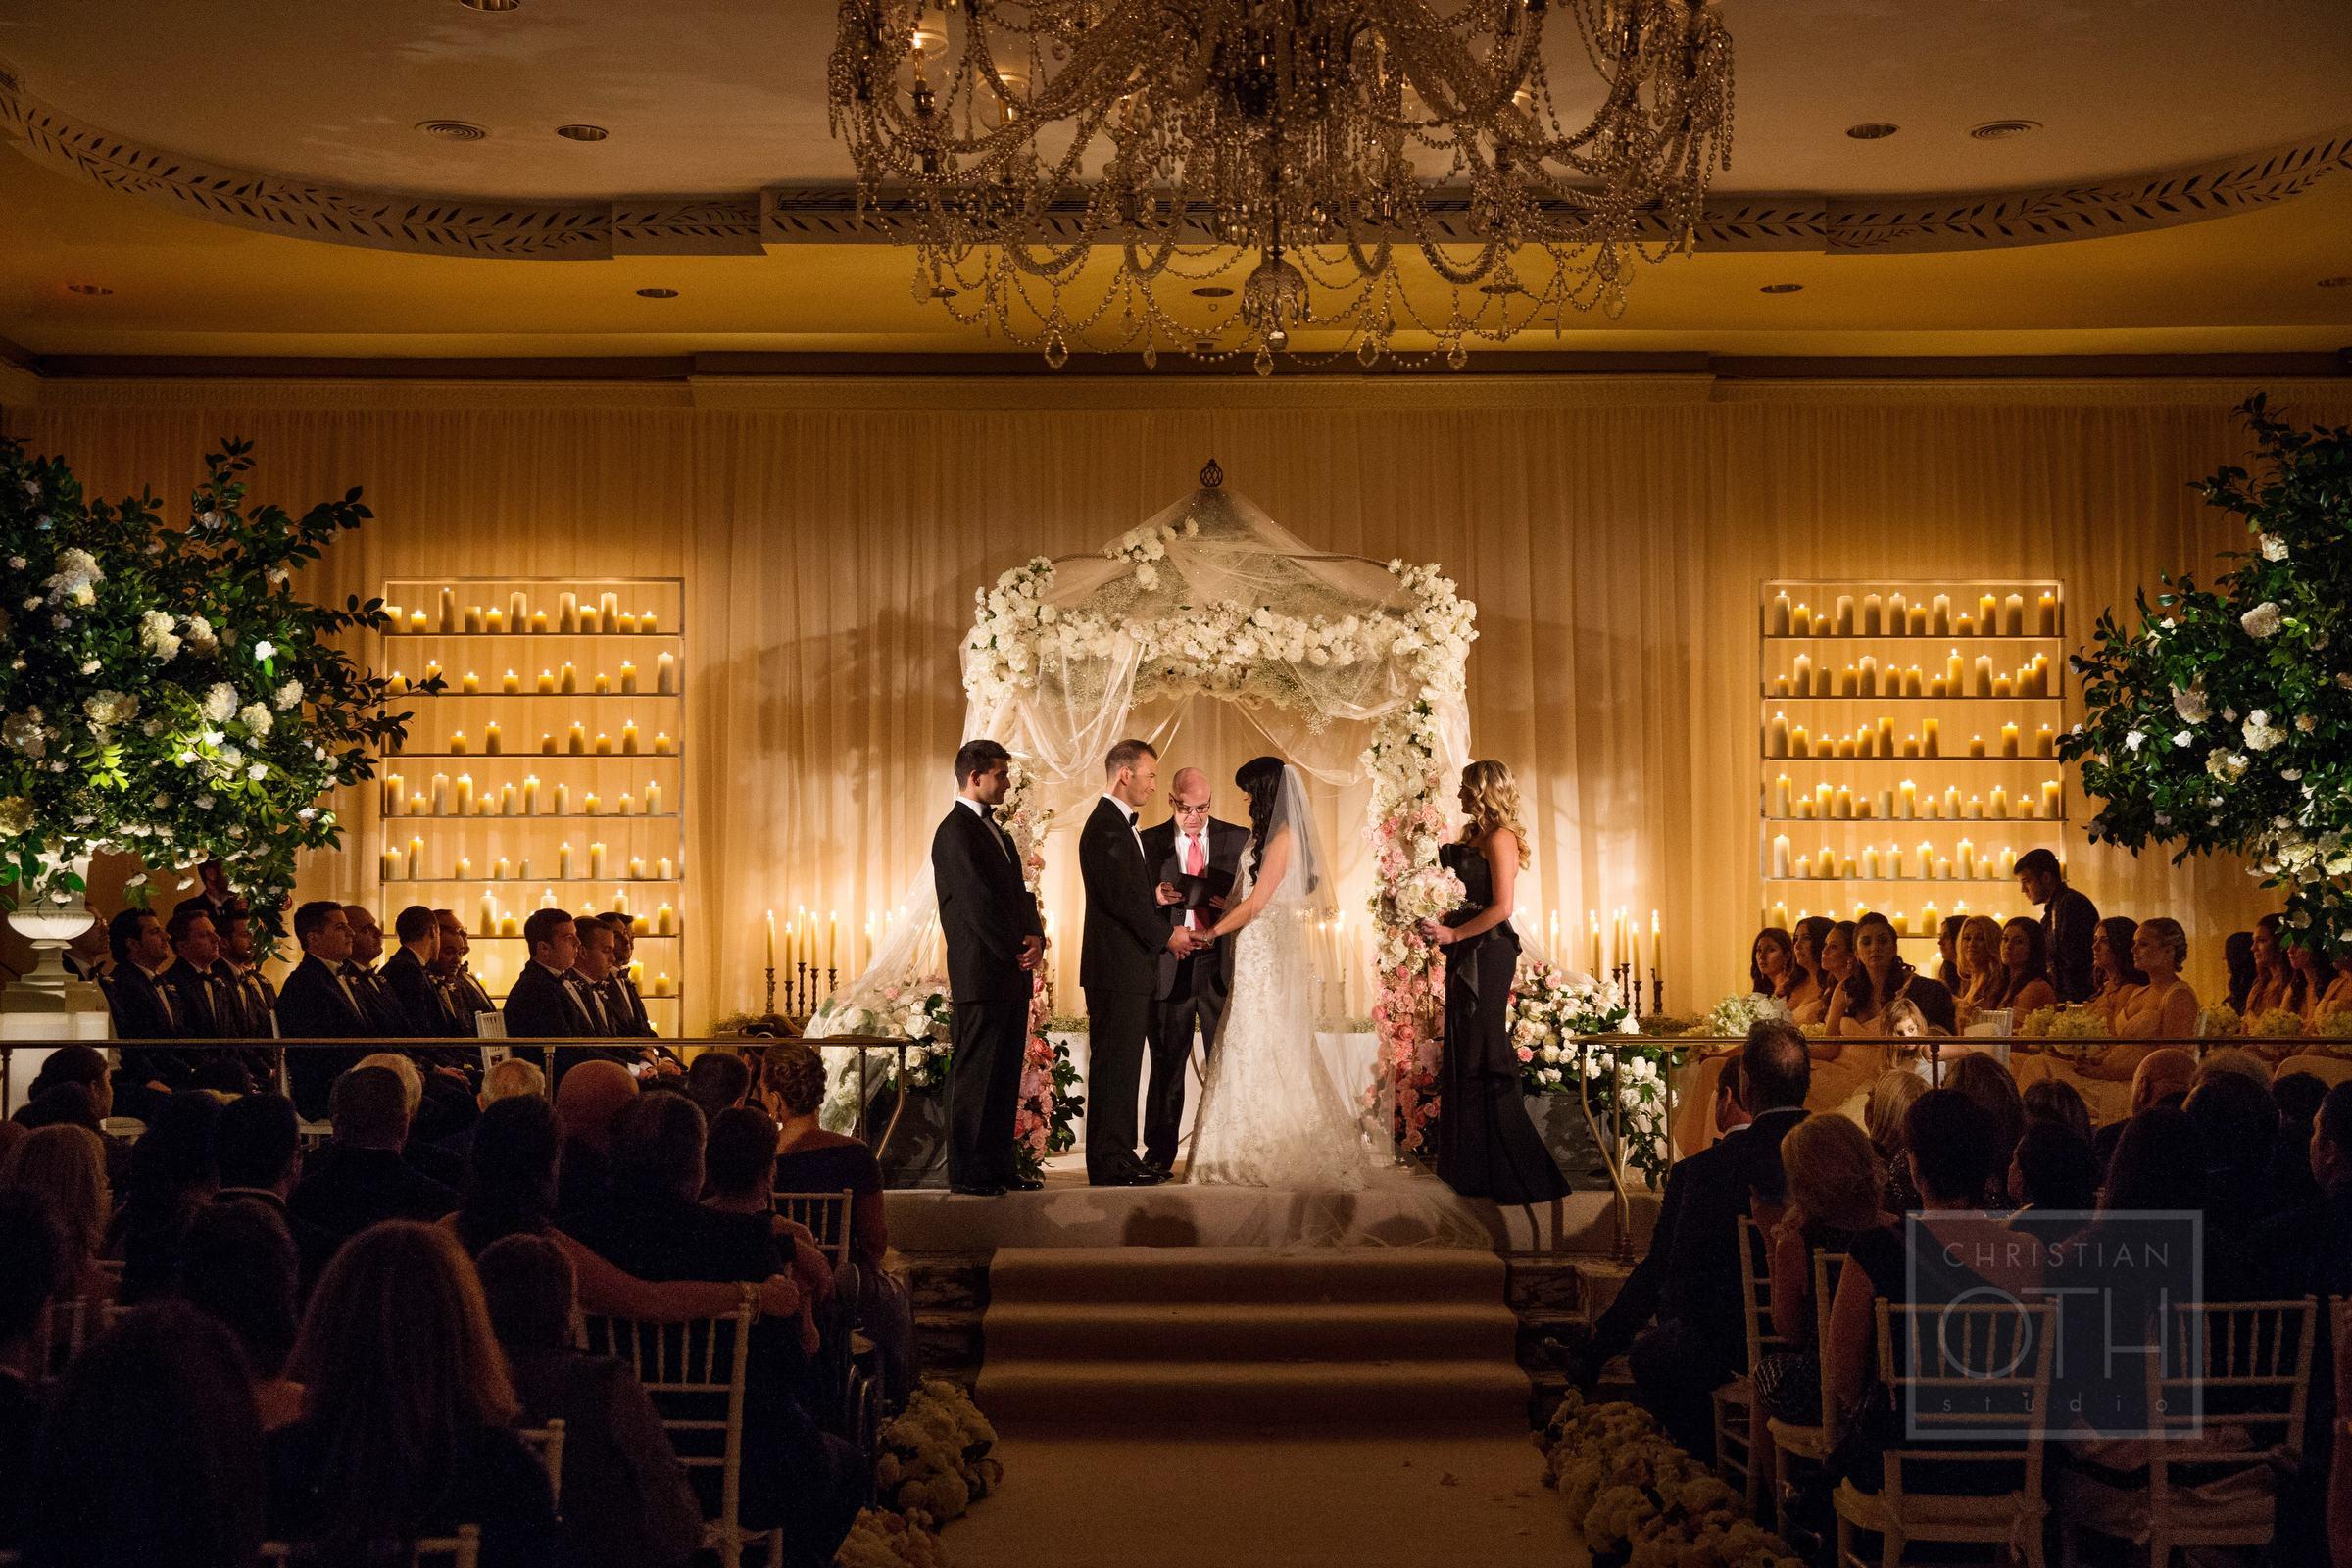 Ceci_New_York_Custom_Invitation_Pierre__City_ Destination_Wedding_Luxury_Personalized_Ceci_Style_Bride_Rose_Gold_Foil_Stamping96.JPG